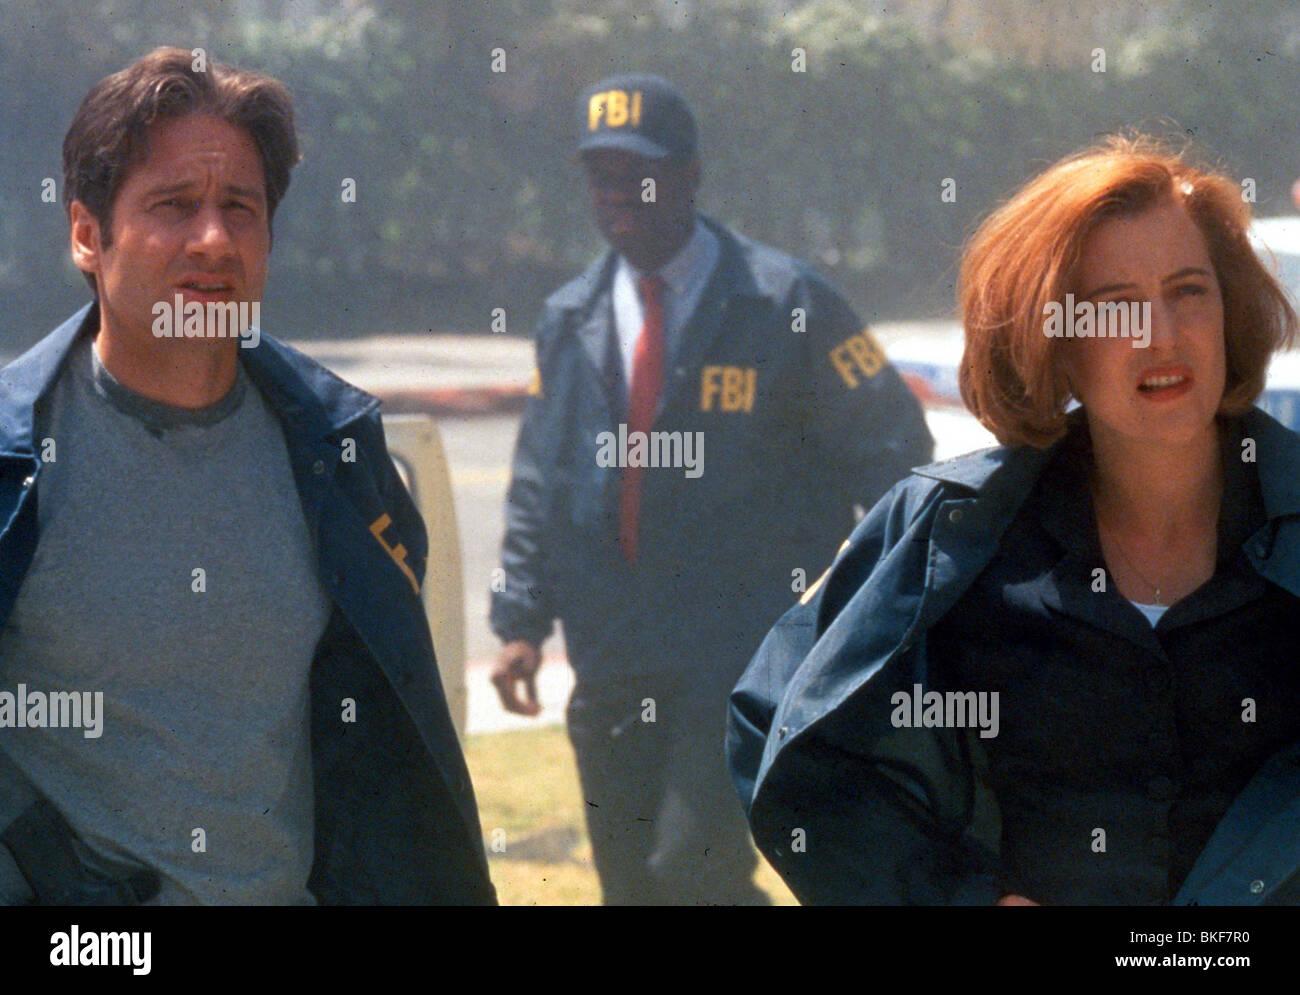 X-FILES: THE MOVIE (1998) DAVID DUCHOVNY, GILLIAN ANDERSON XFM 075 N - Stock Image